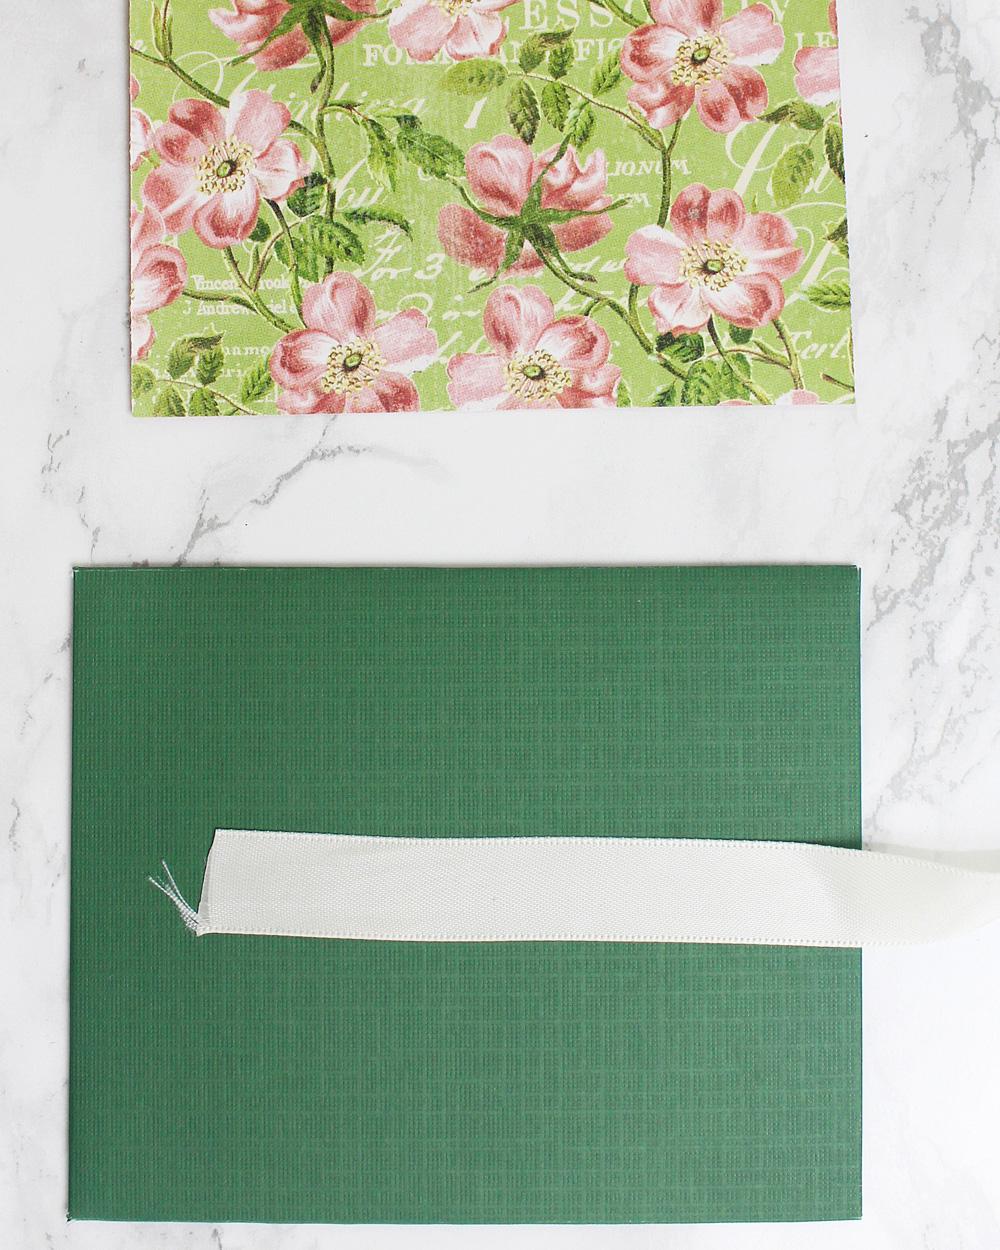 diy-spring-wedding-guest-book-6-0416.jpg